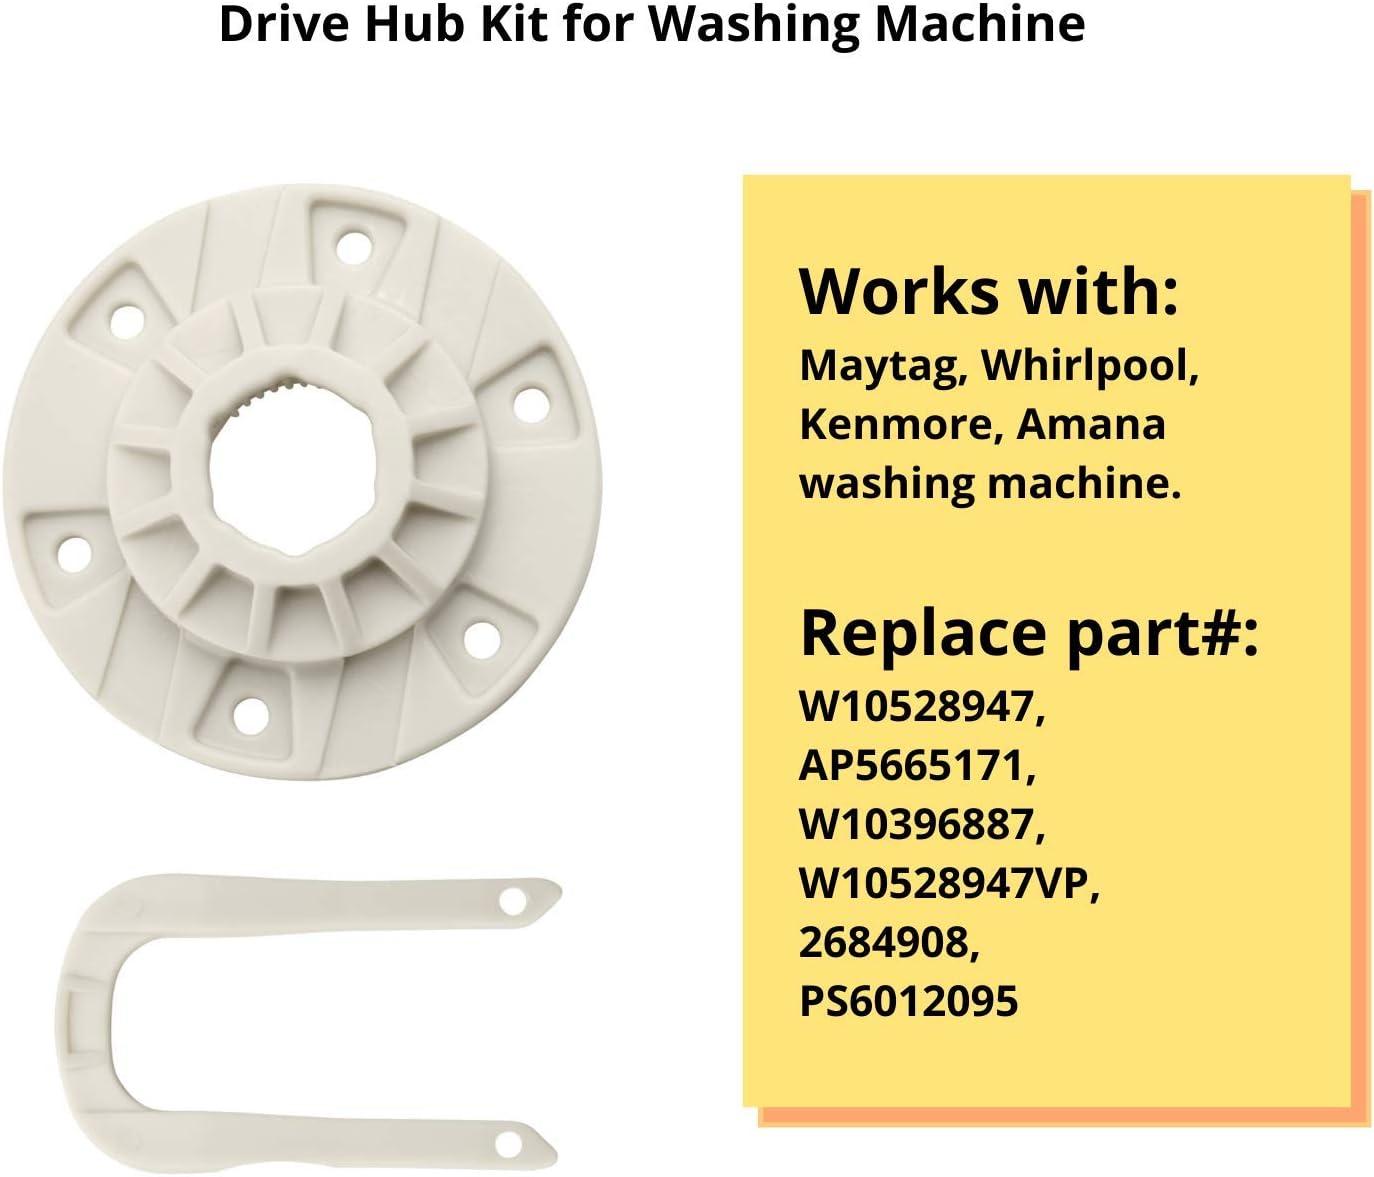 Replaces W10528947 Drive Hub Kit for Washing Machine Washer Basket Drive Hub Fit for Maytag Whirlpool Kenmore Amana Washing Machine